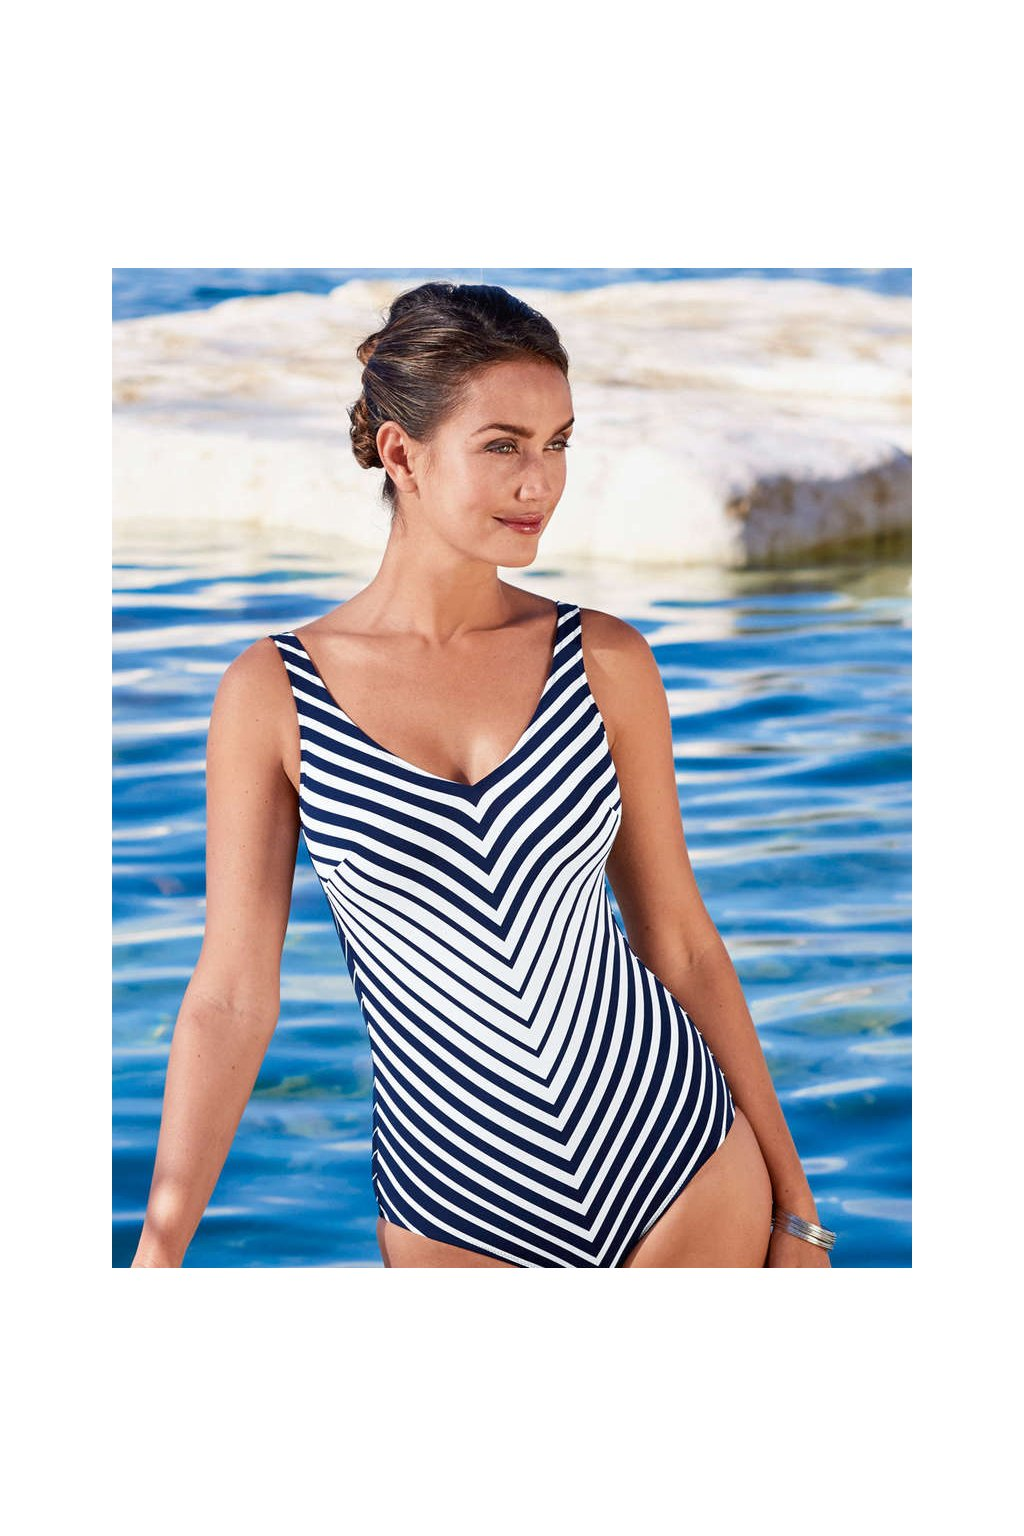 Anita Comfort Bikinis Tankinis 7307 345 045 ml